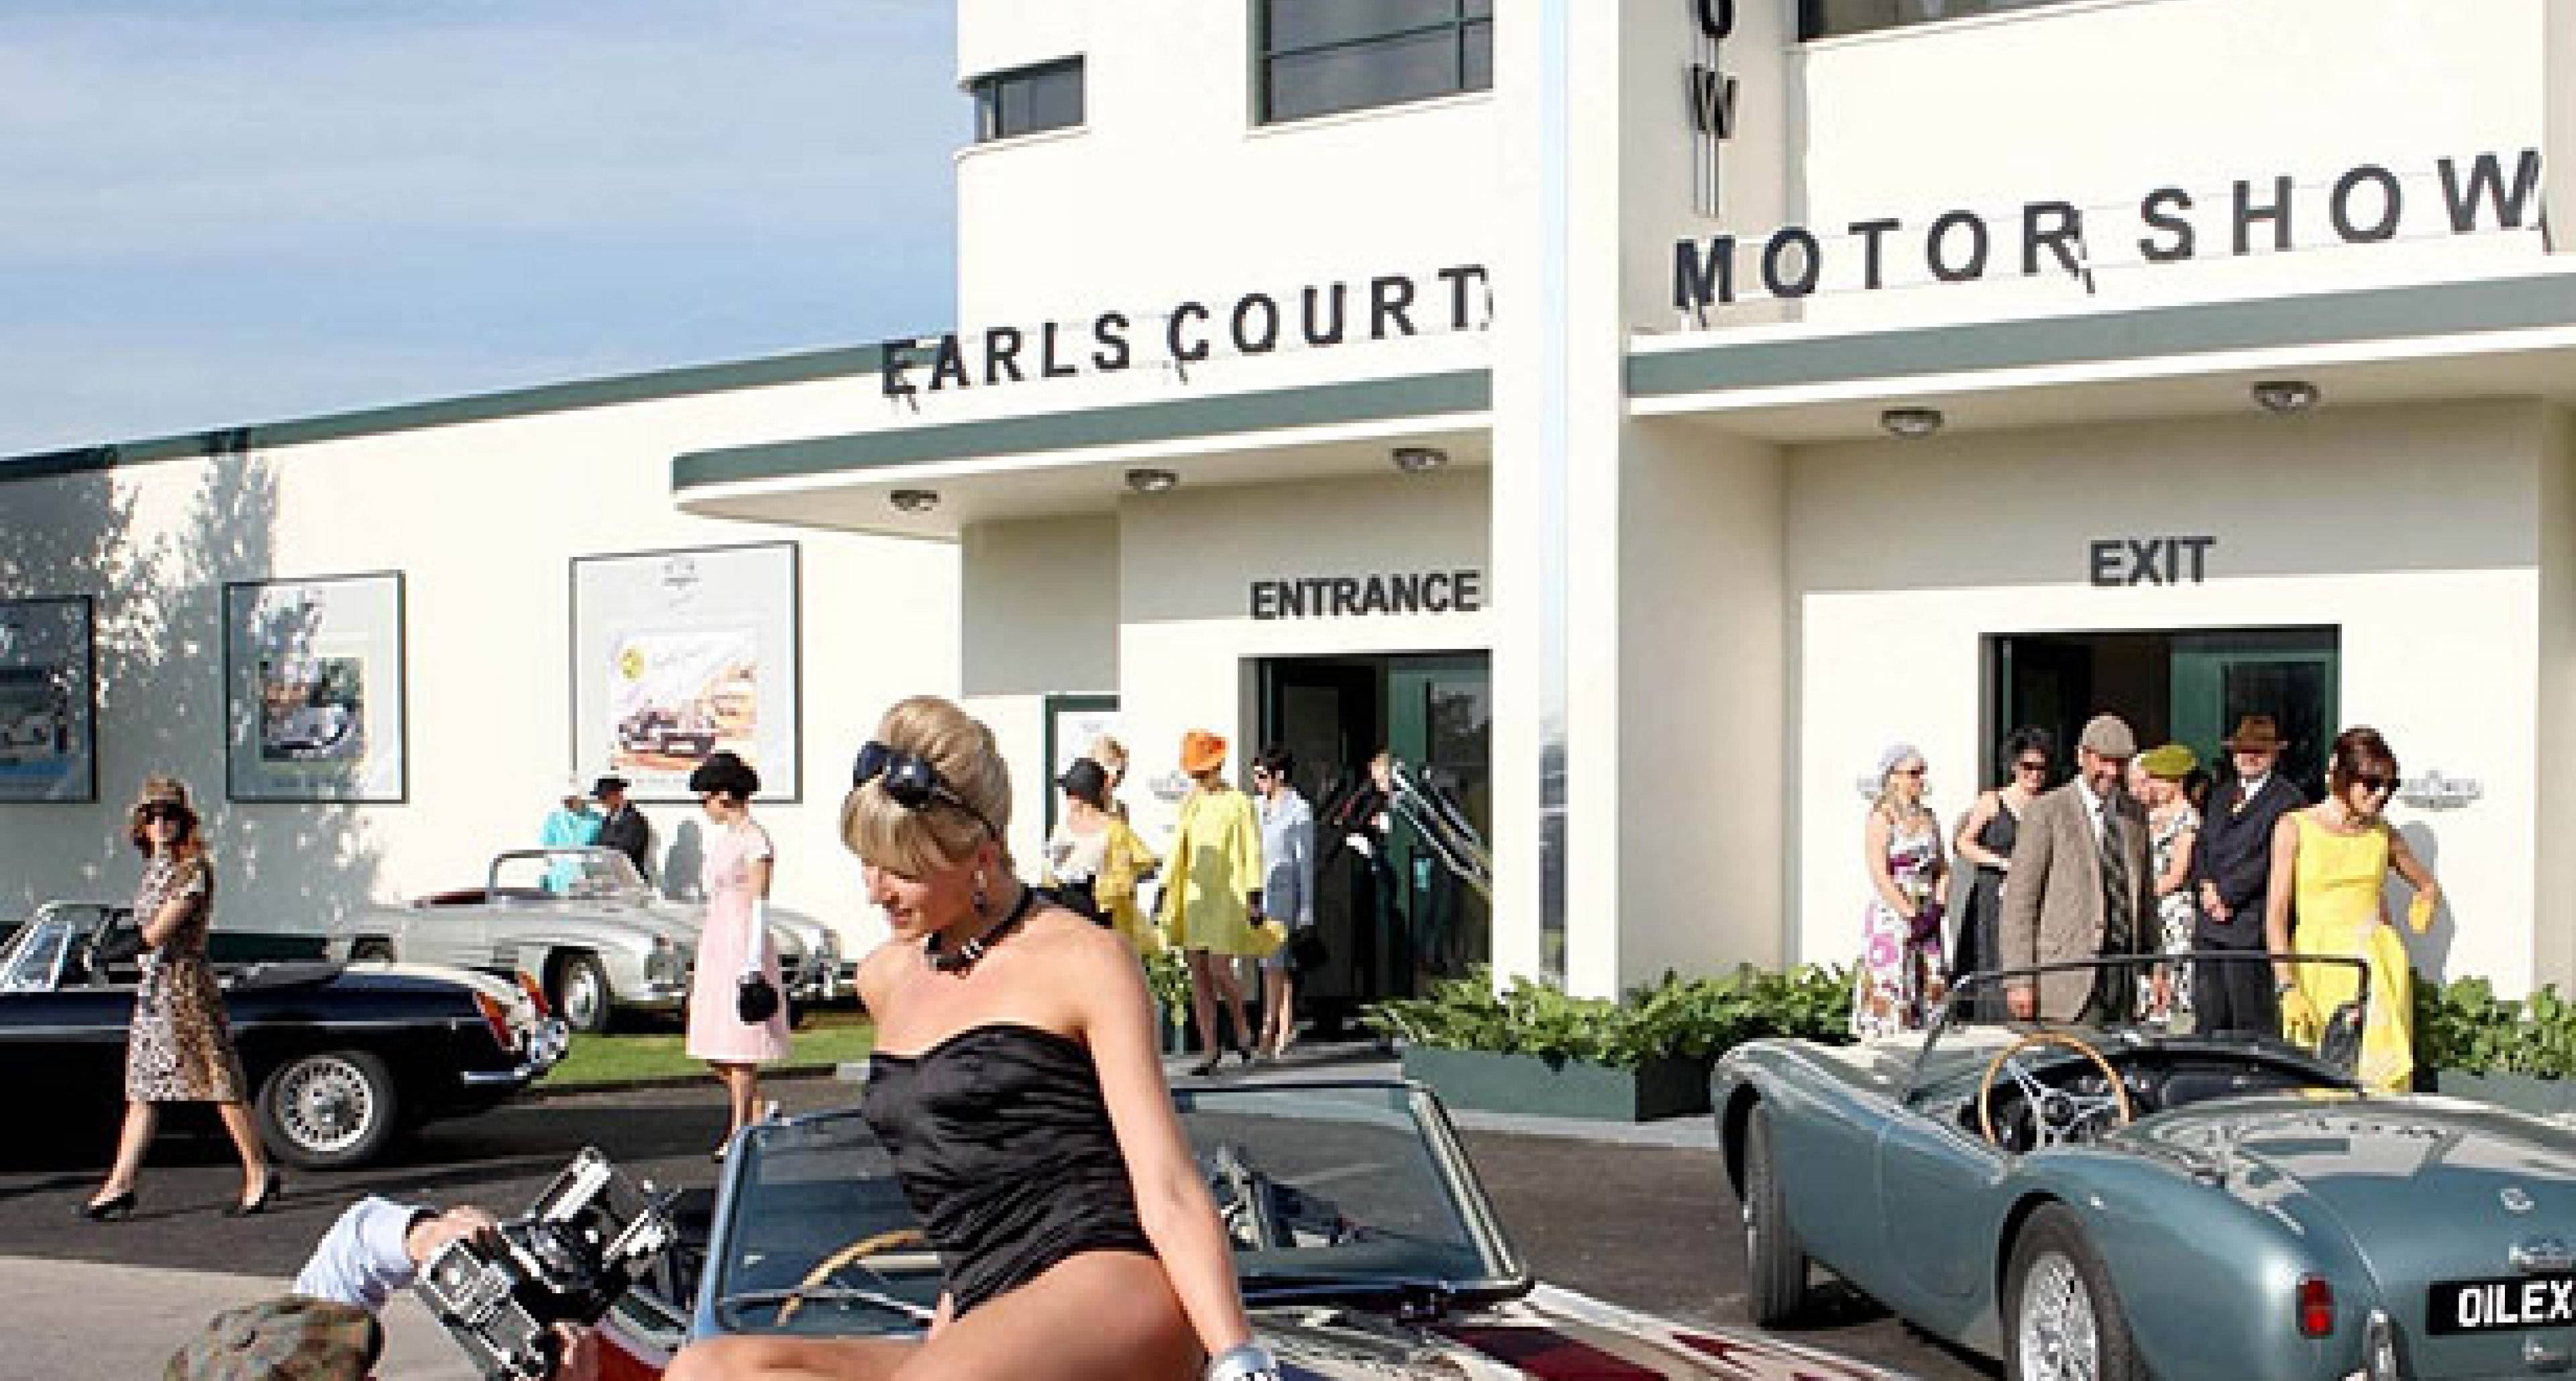 Goodwood Revival Motor Show?